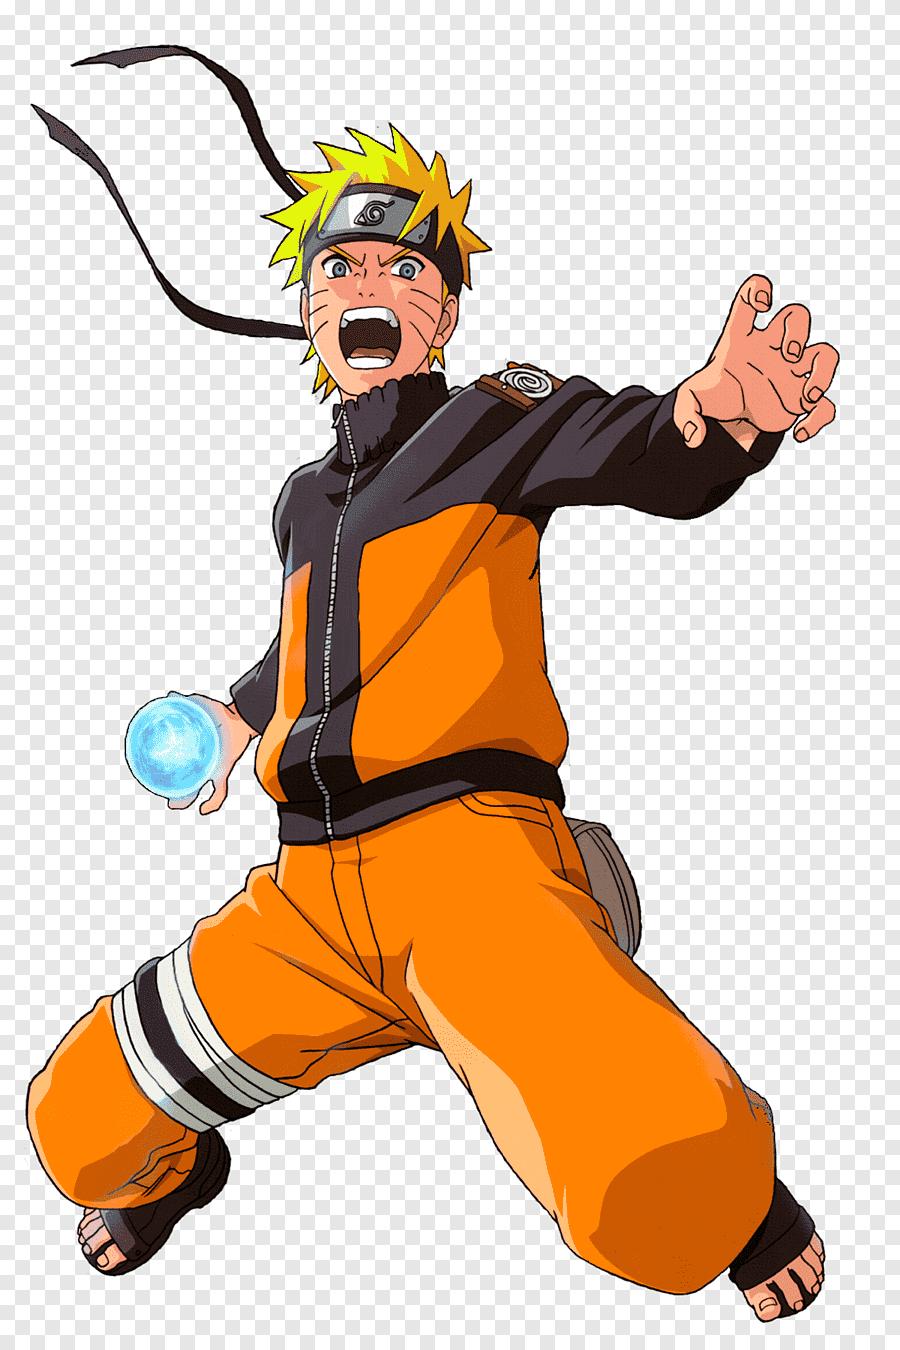 Naruto With Rasengan png